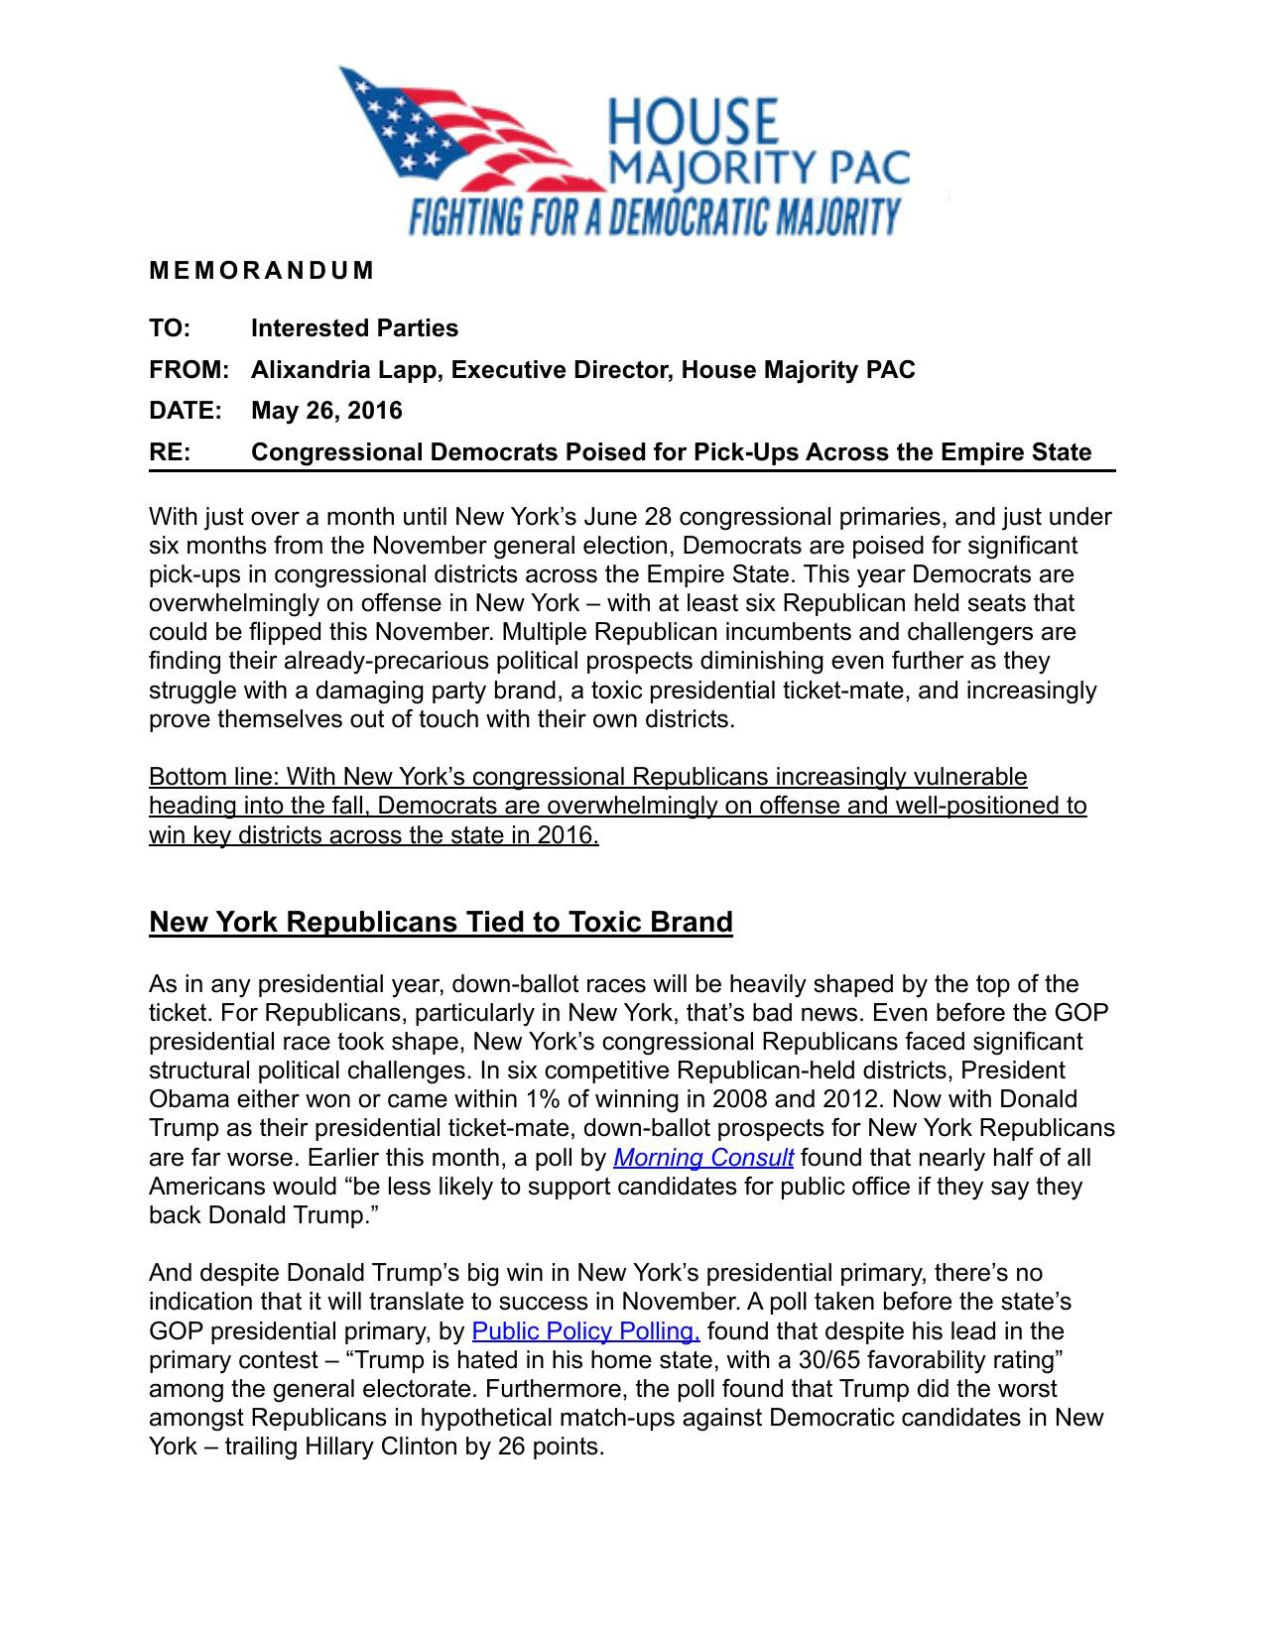 Download PDF House Majority PAC New York Memo